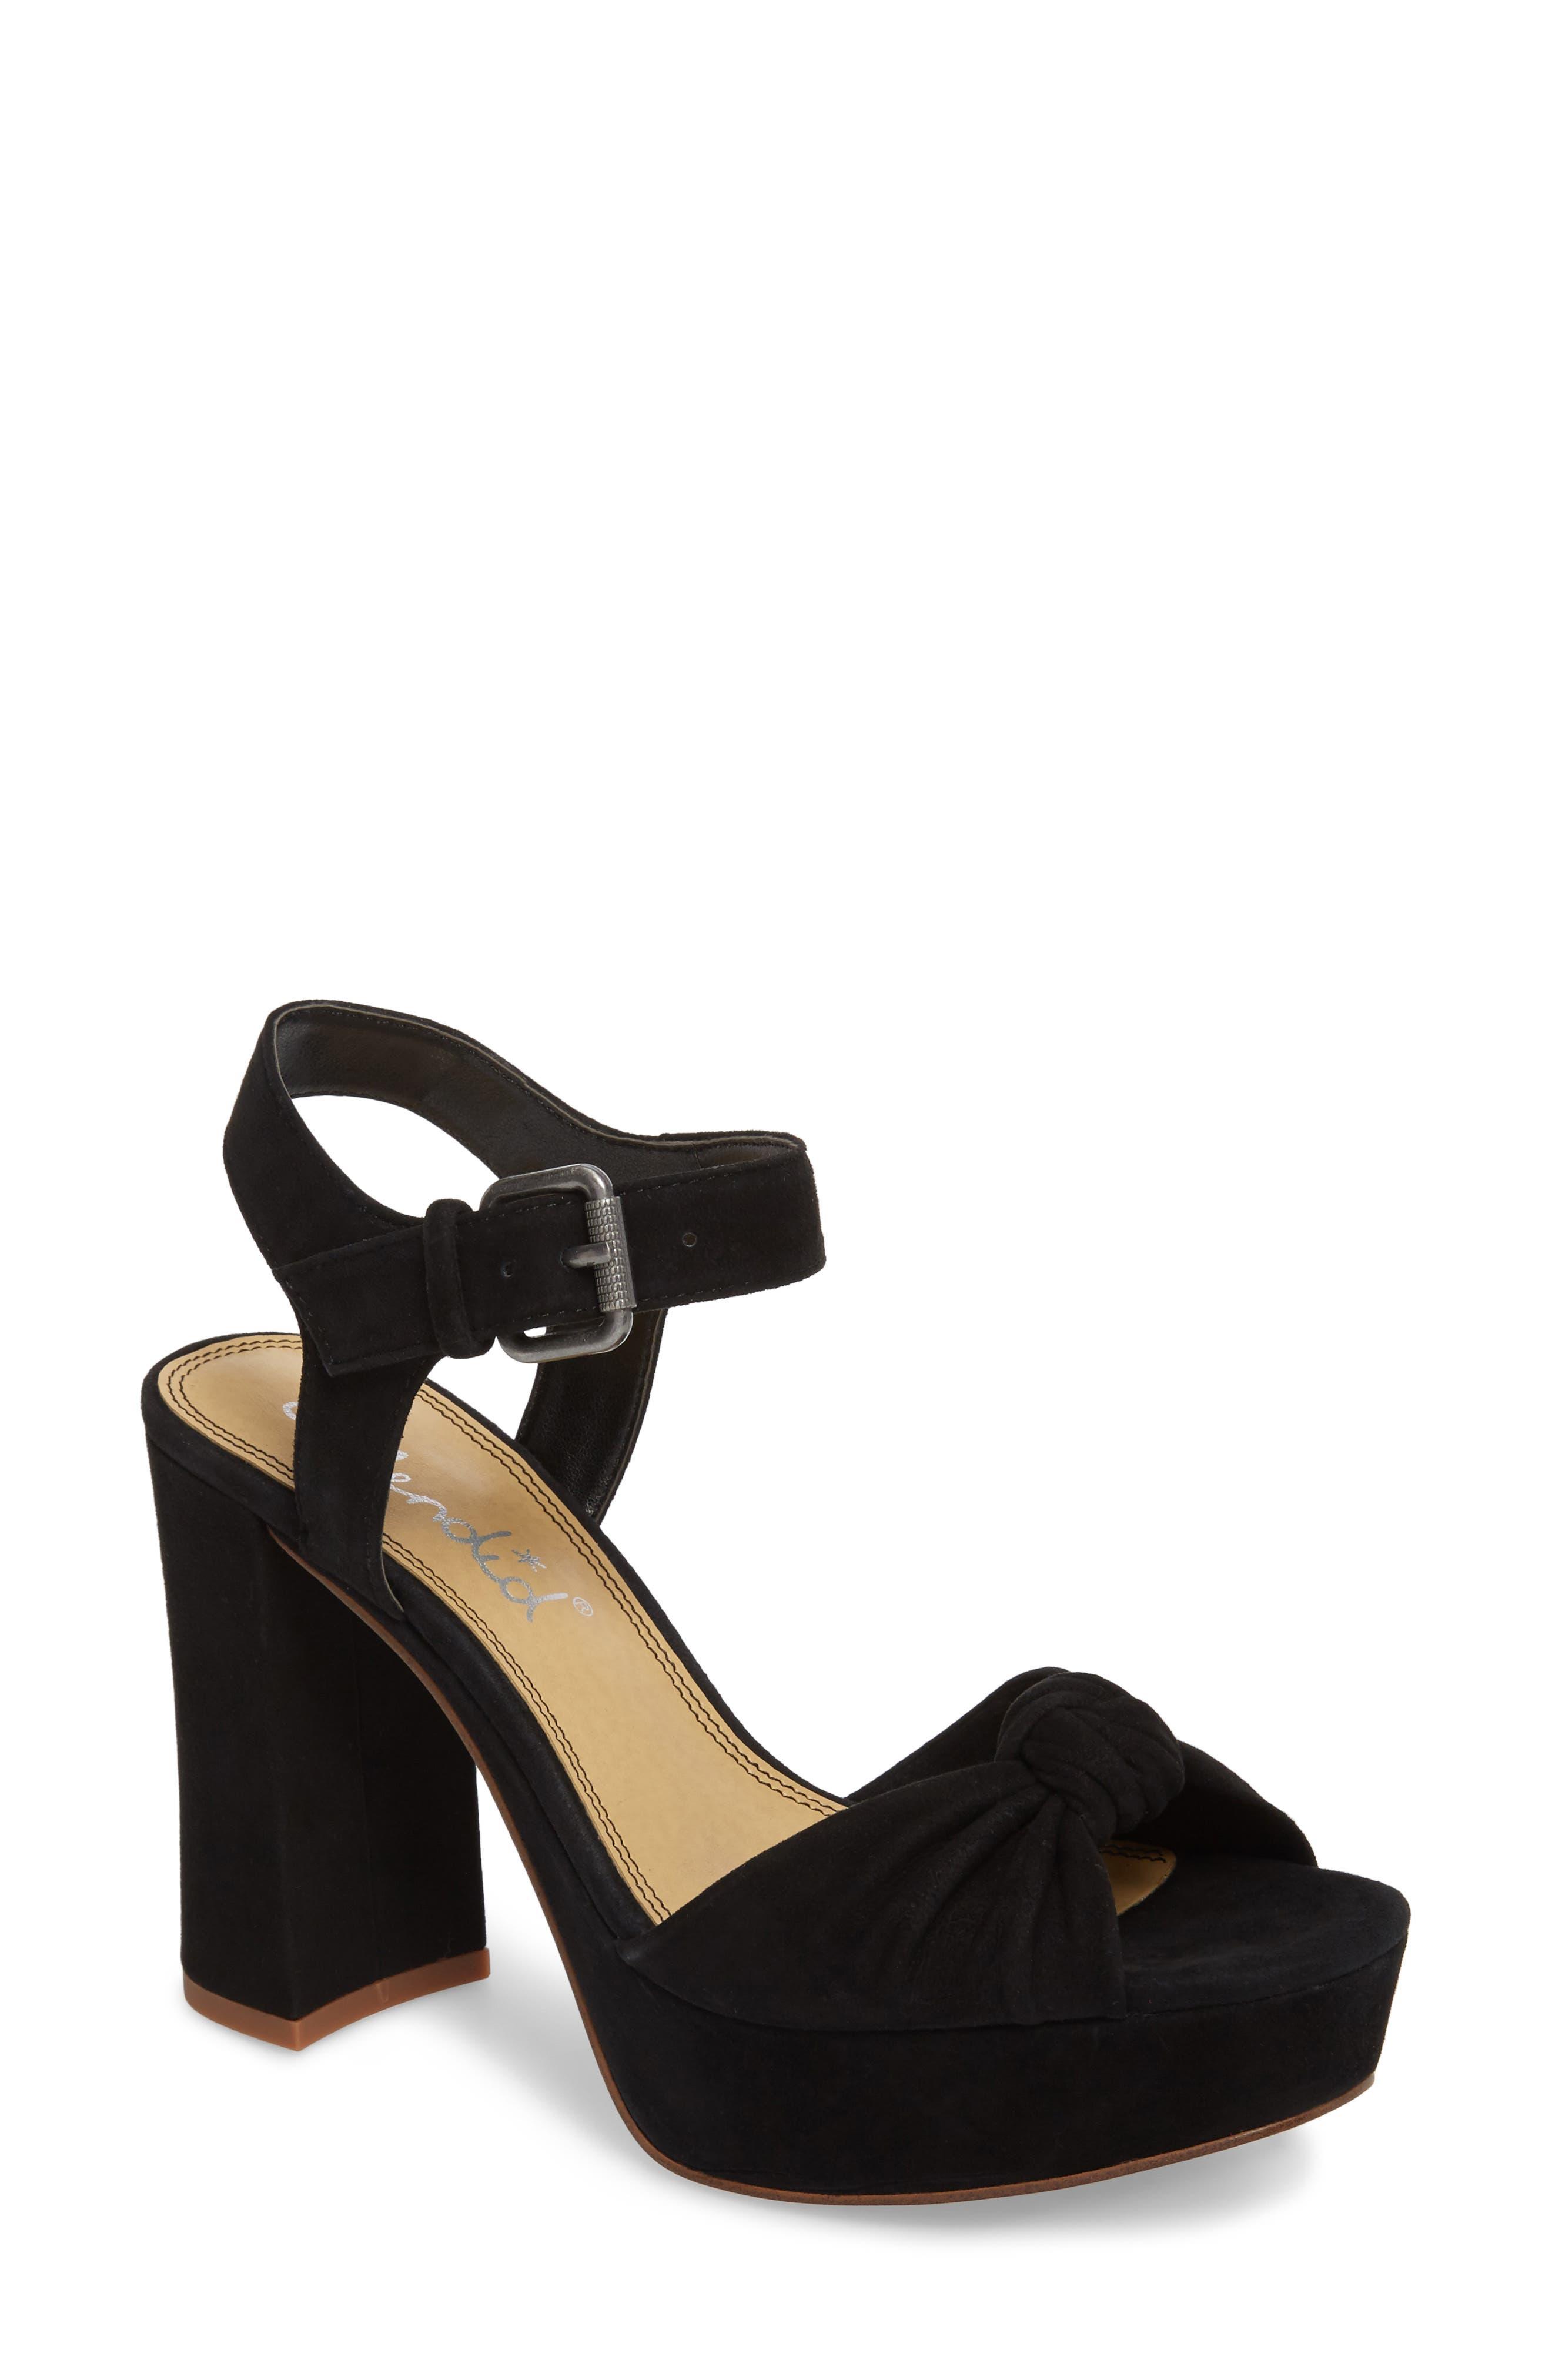 Bates Platform Sandal,                         Main,                         color, BLACK SUEDE